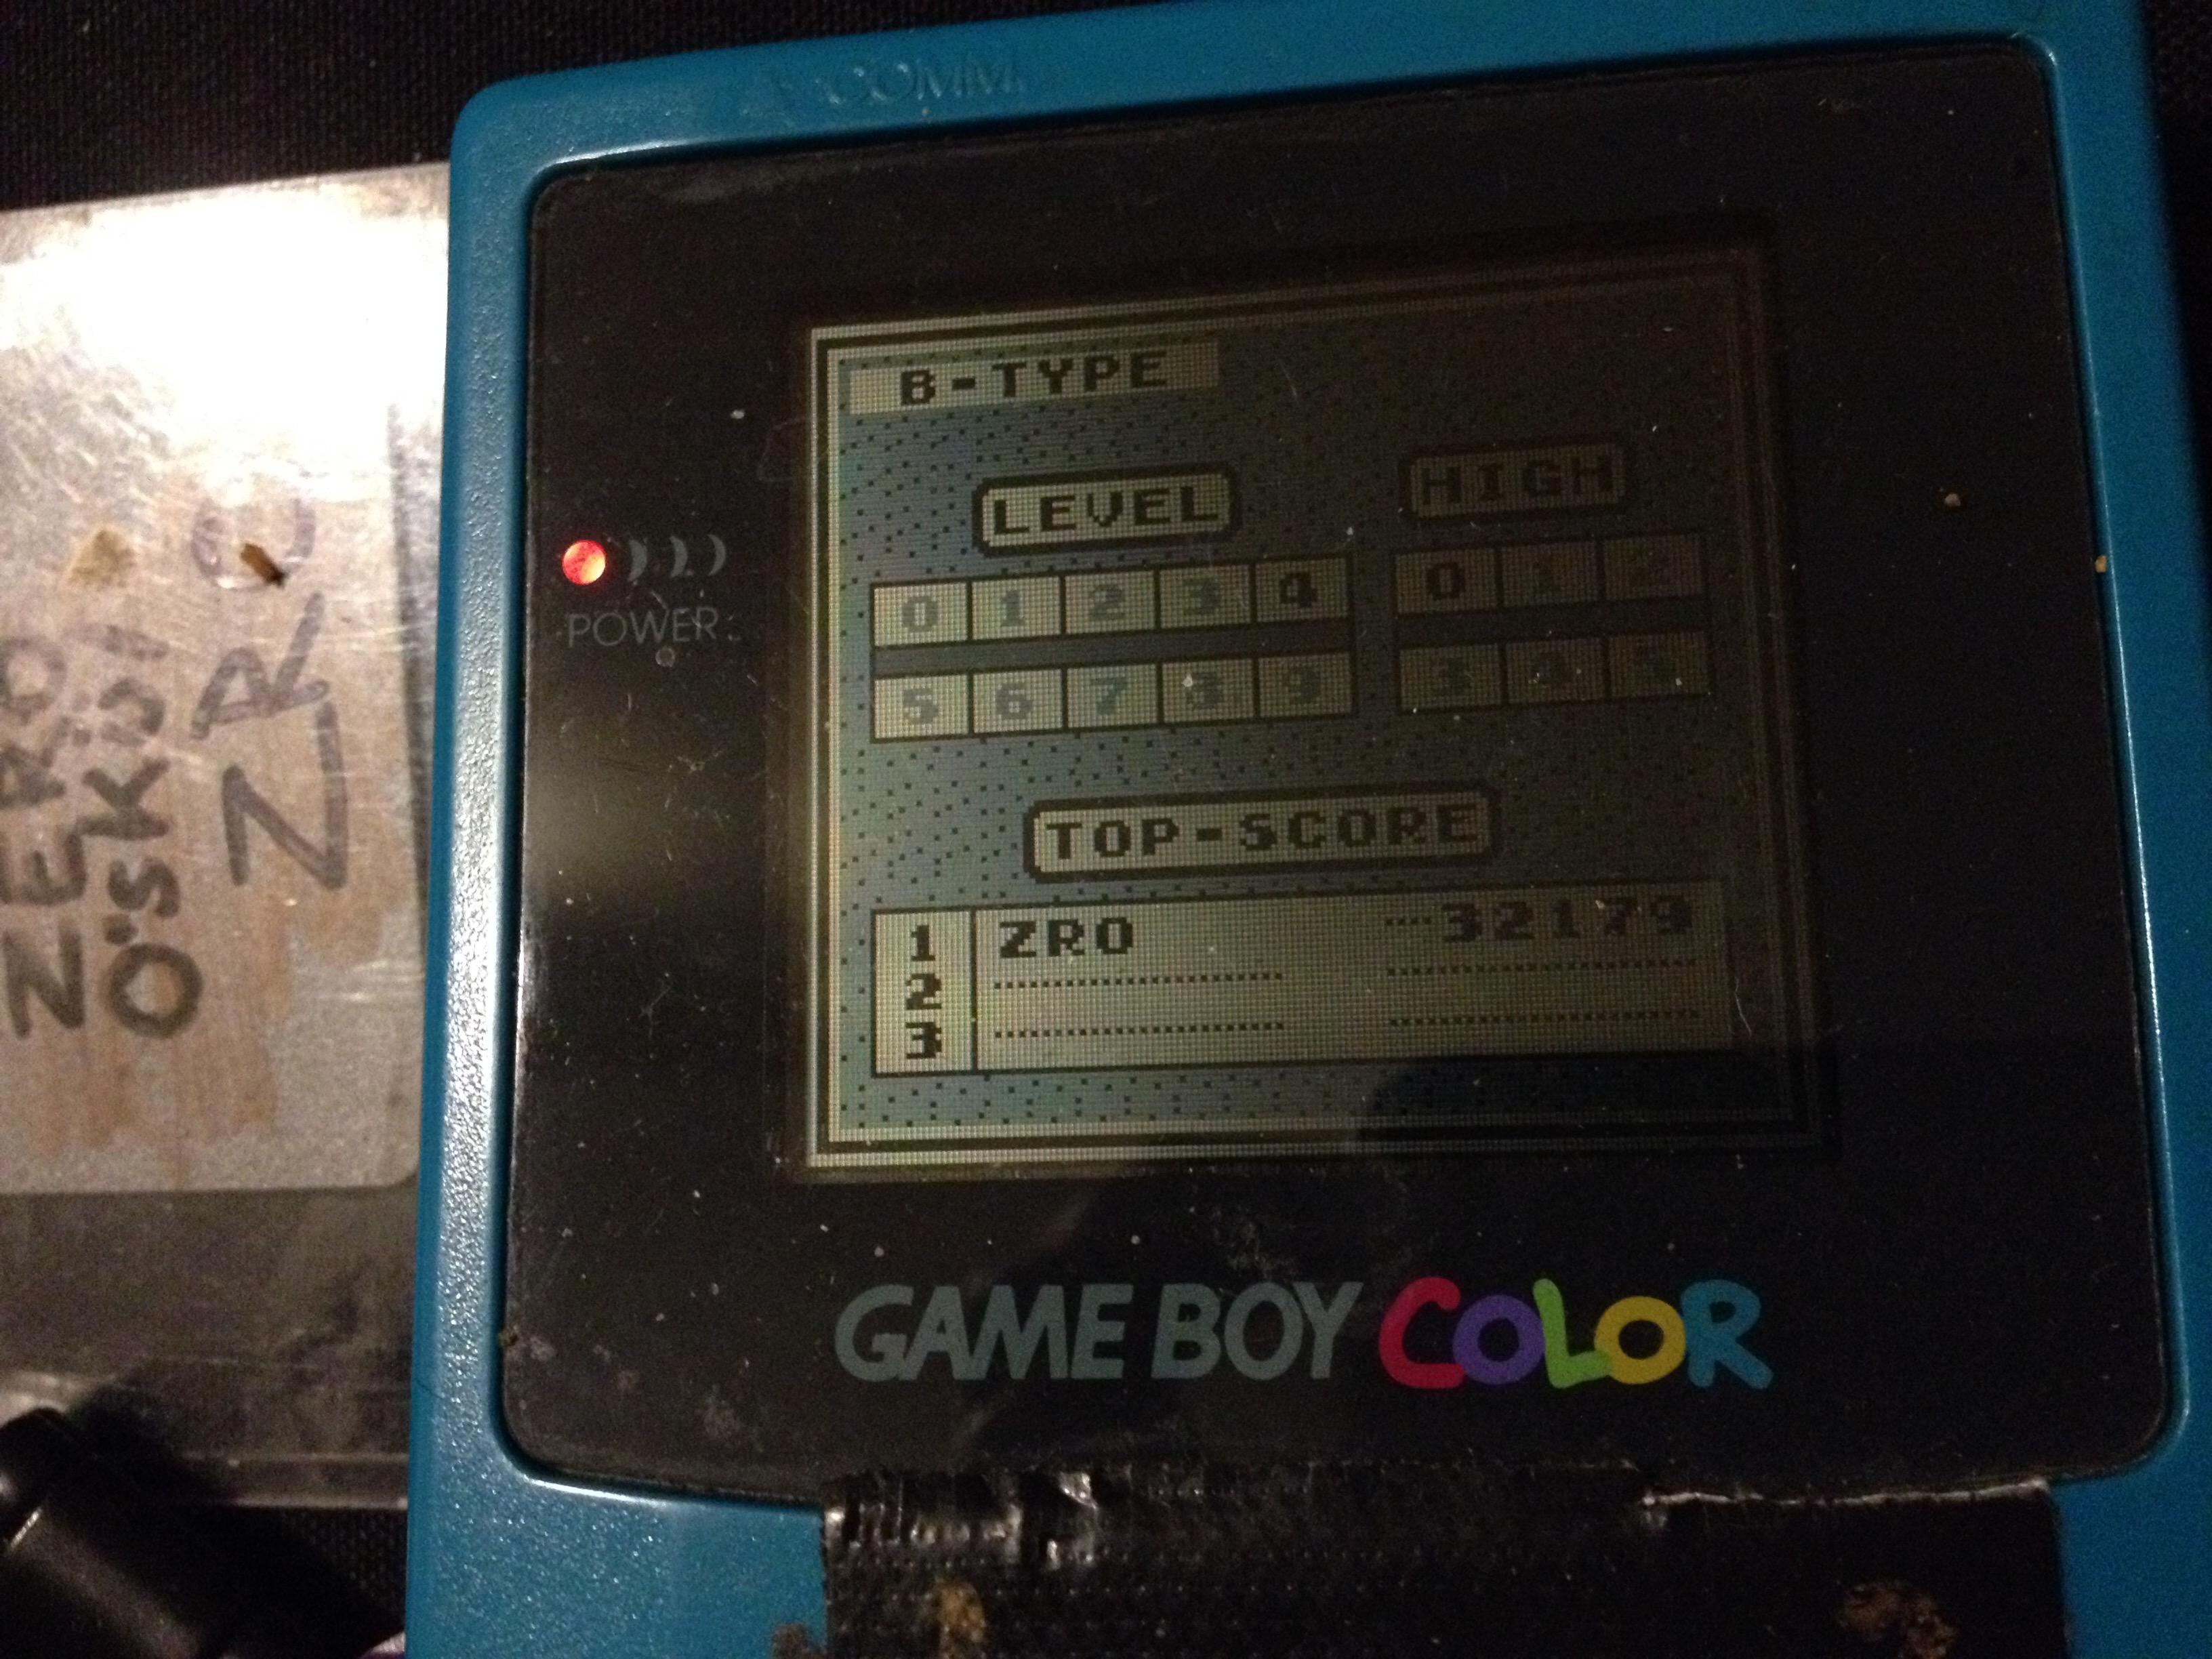 zerooskul: Tetris: Type B [Level 4 / High 0] (Game Boy) 32,179 points on 2019-12-08 23:53:37